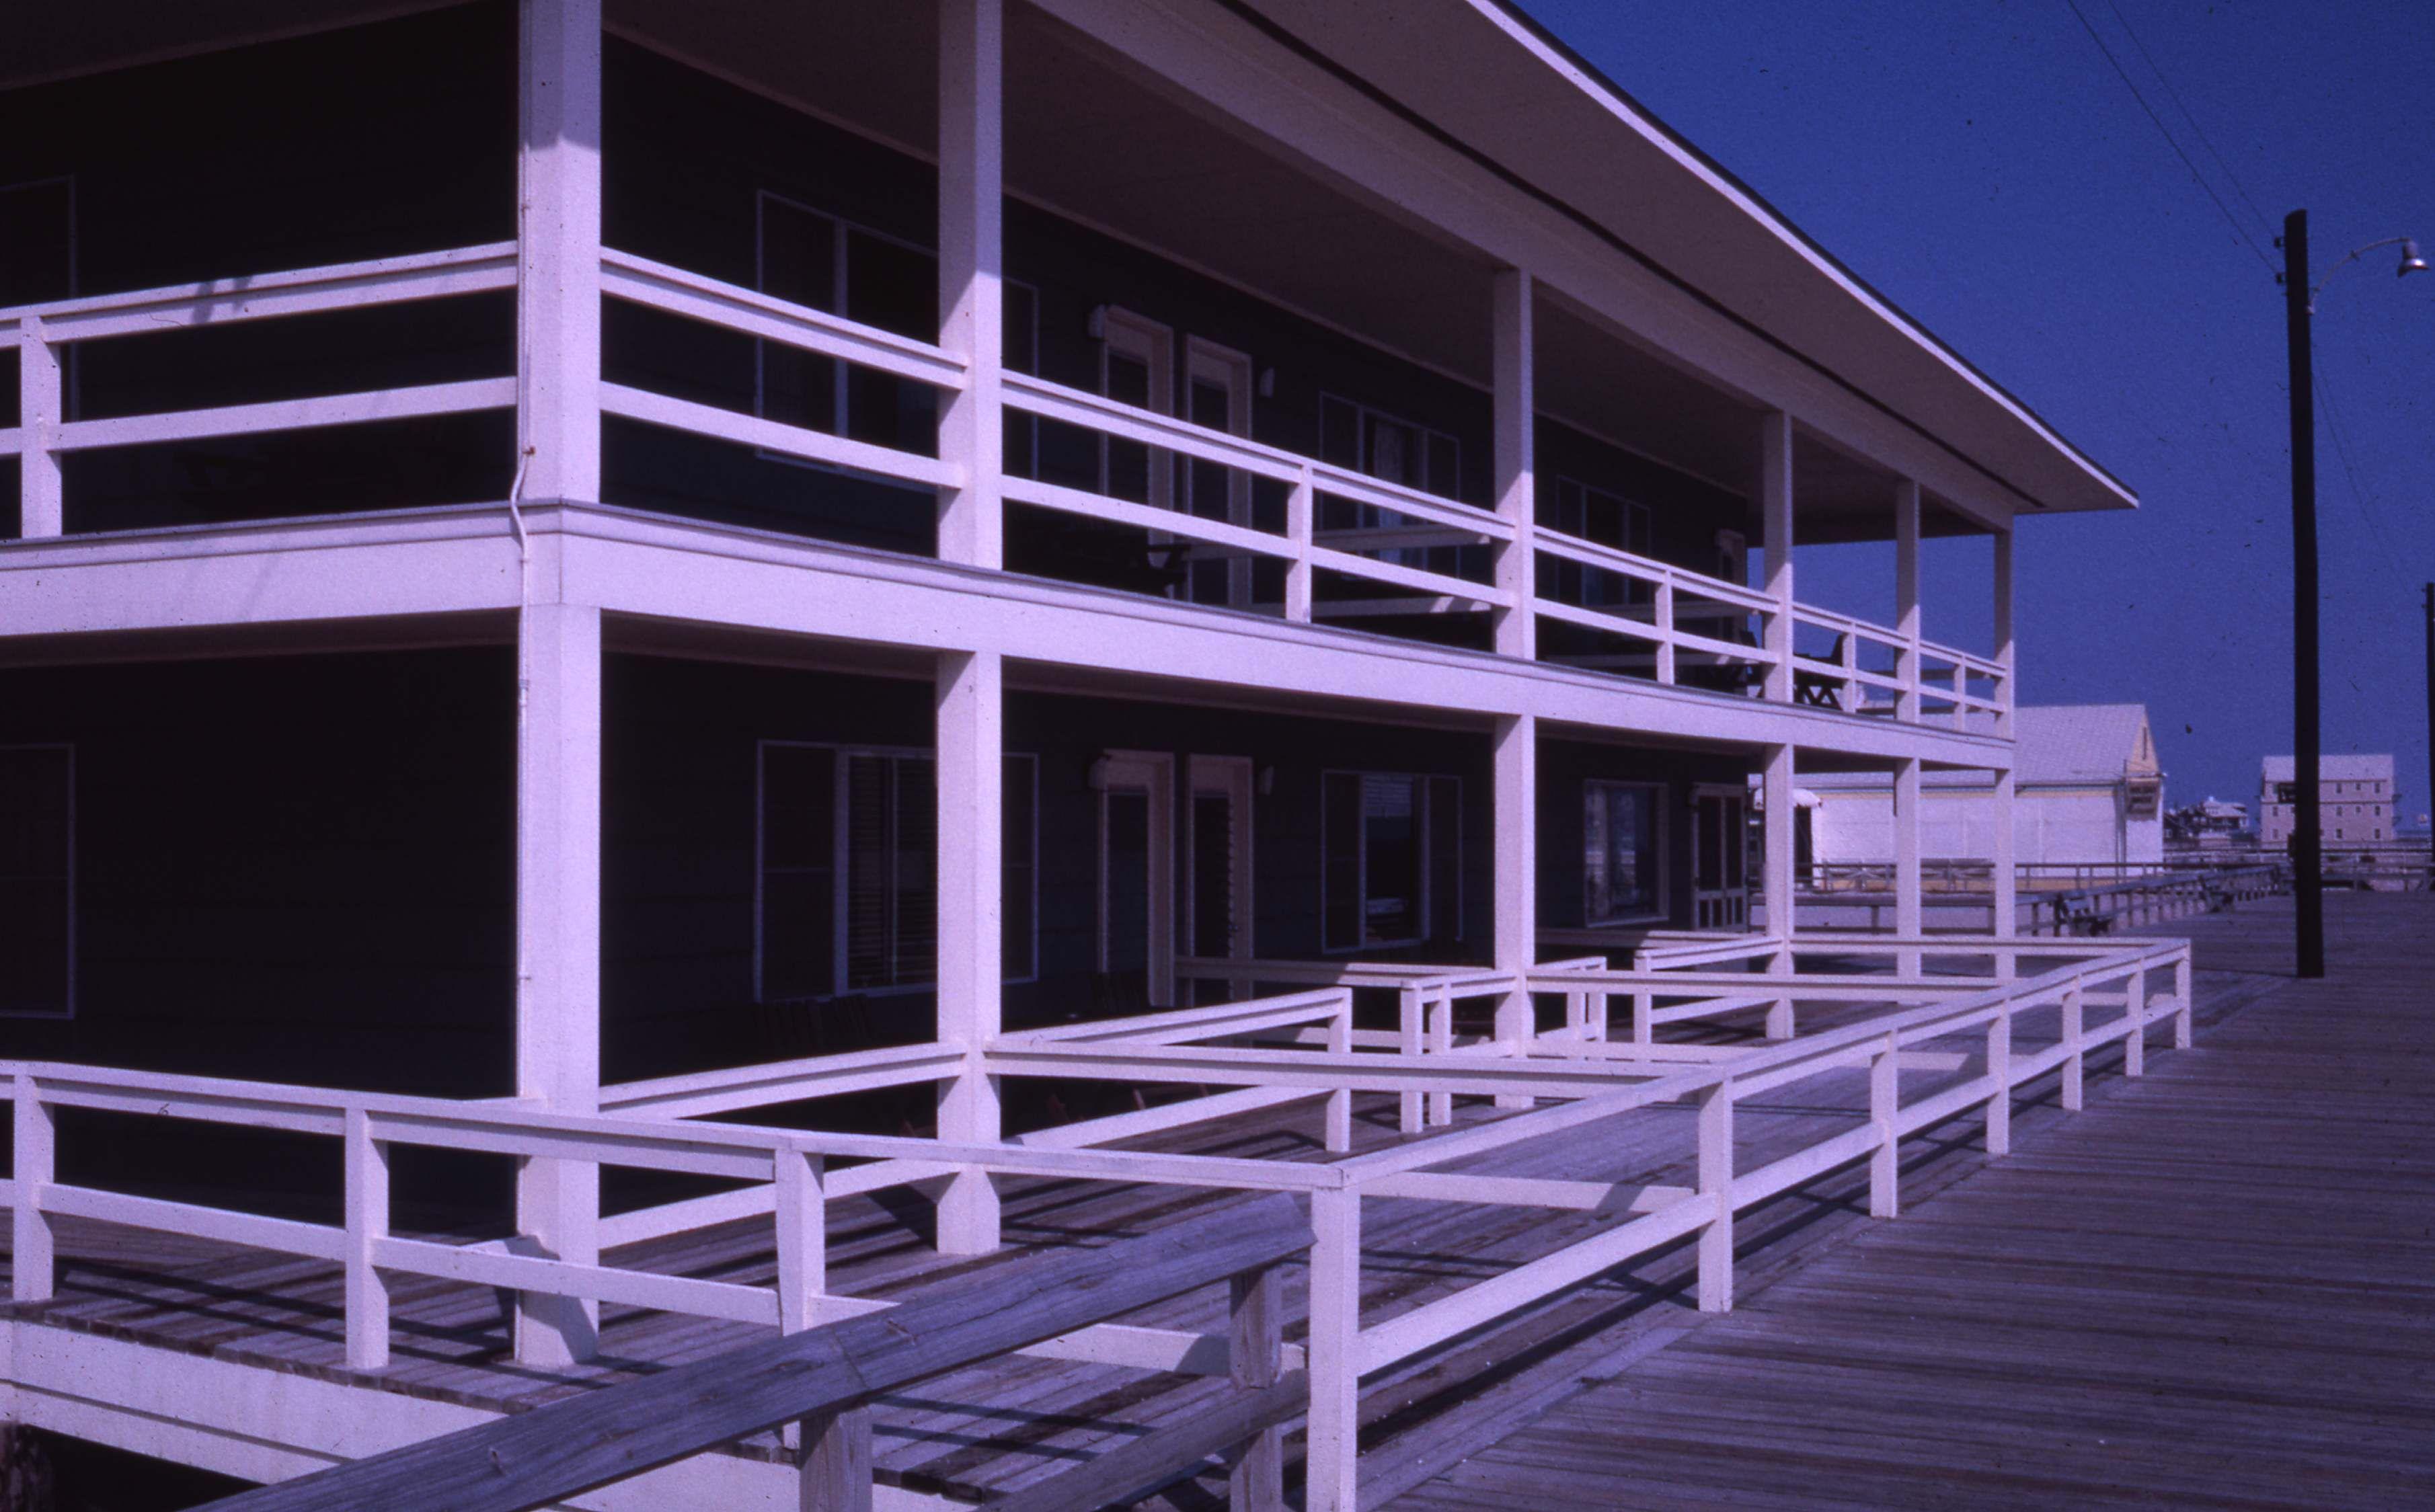 Bethany Beach Blue Surf Hotel 9015 036 001 5229 Delaware